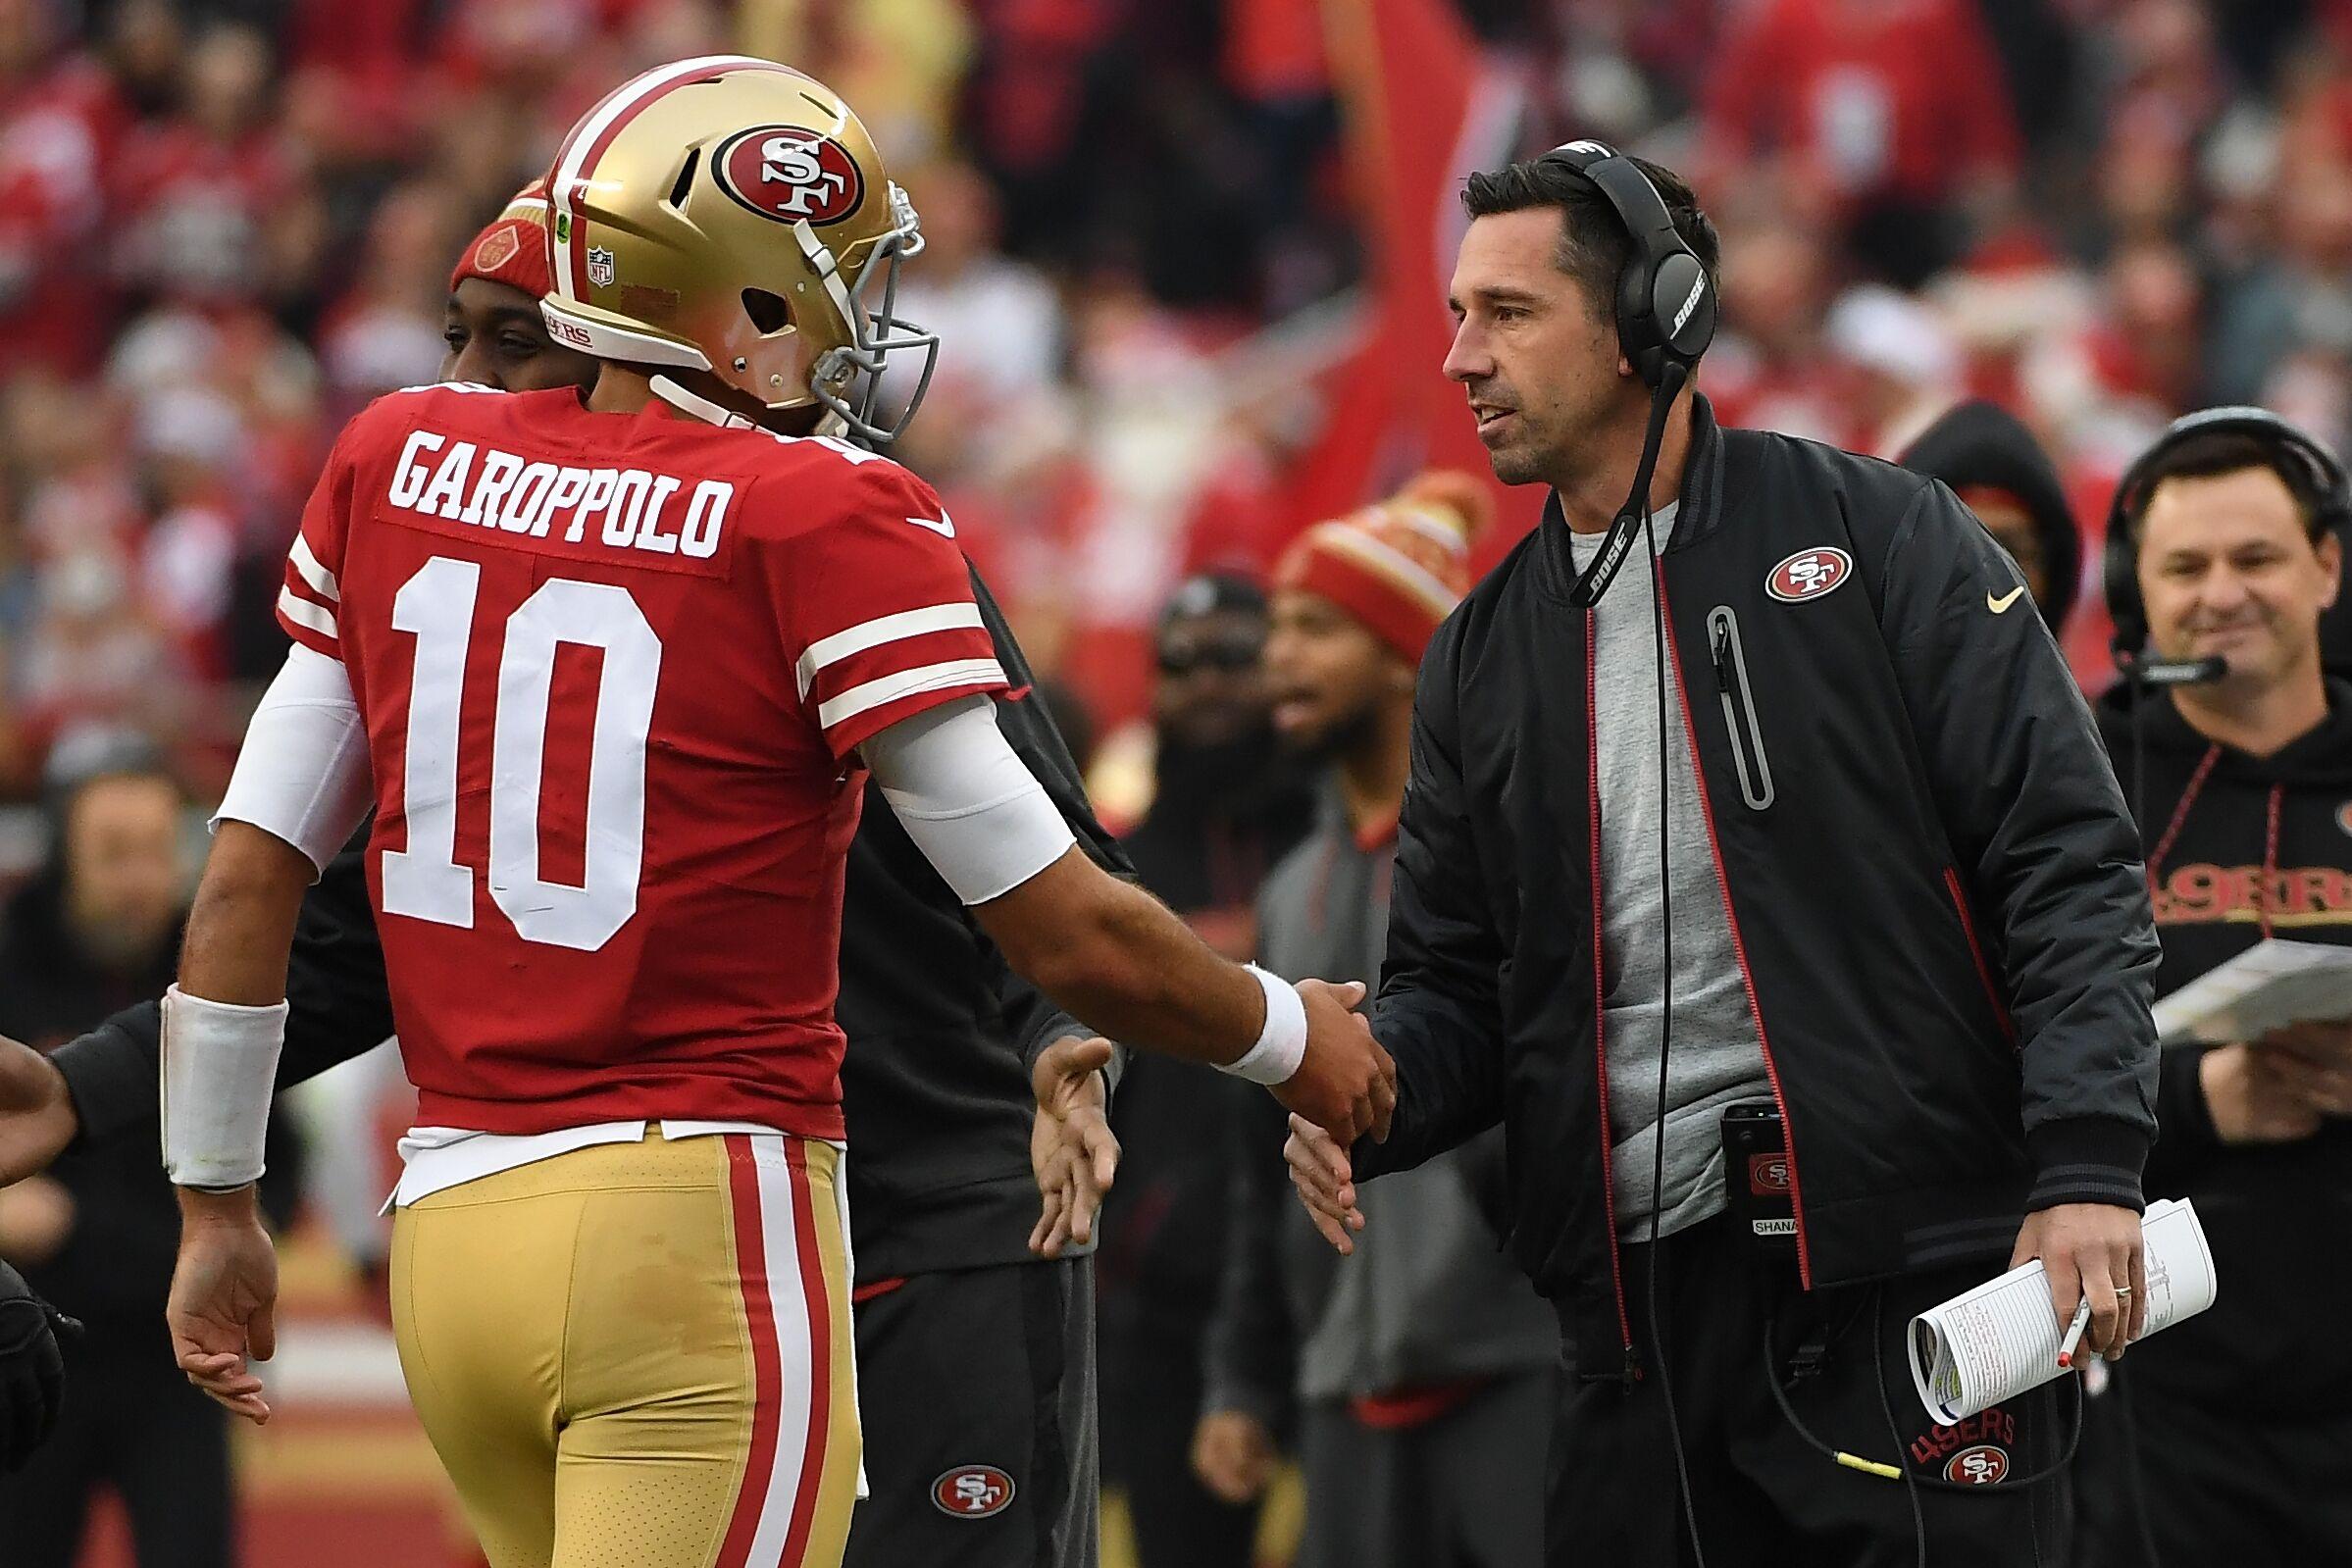 SANTA CLARA, CA - DECEMBER 24: Head coach Kyle Shanahan of the San Francisco 49ers congratulates Jimmy Garoppolo